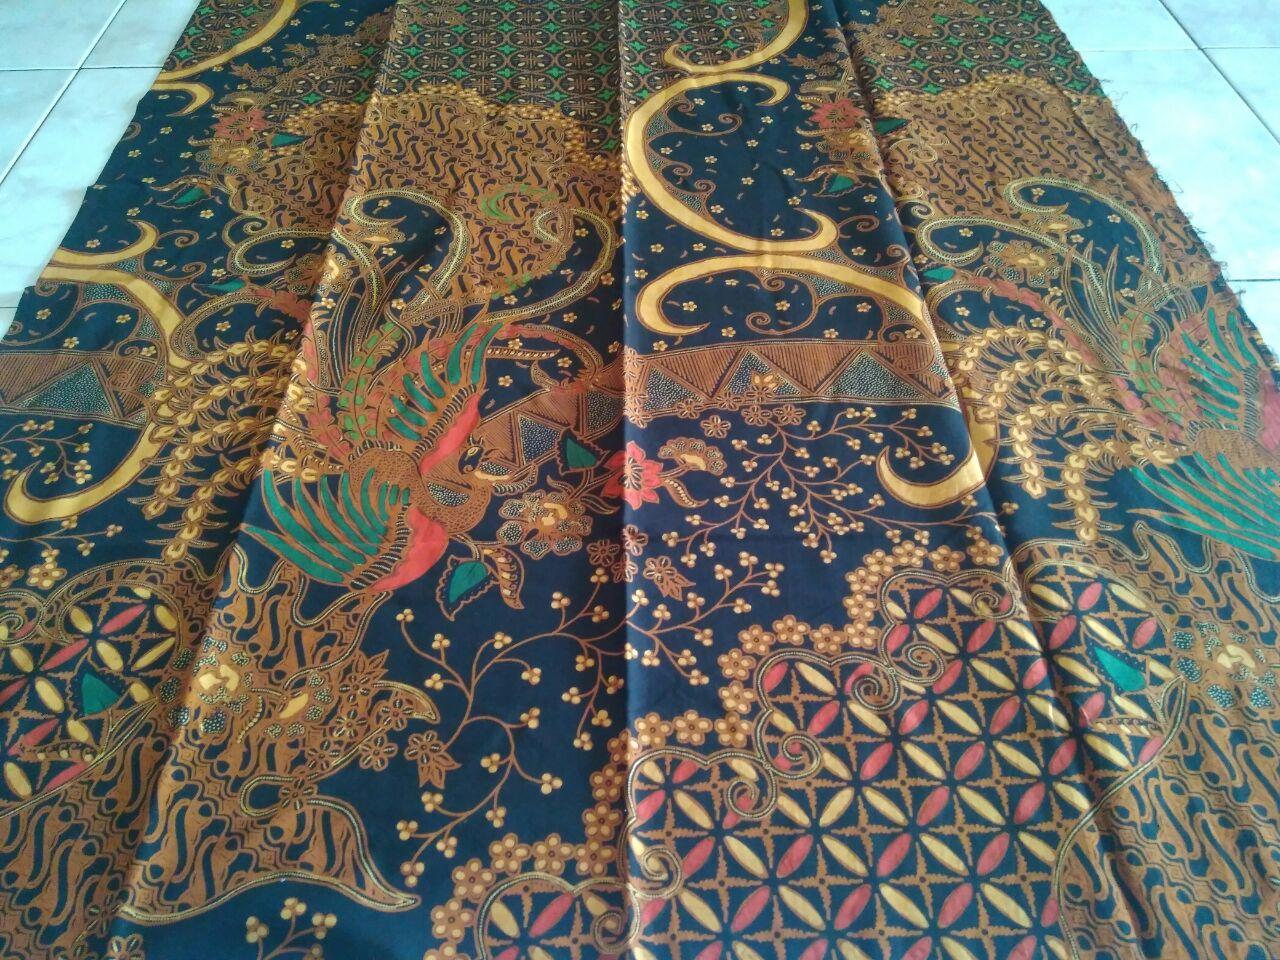 kain batik sablon malam motif batik tulis halus